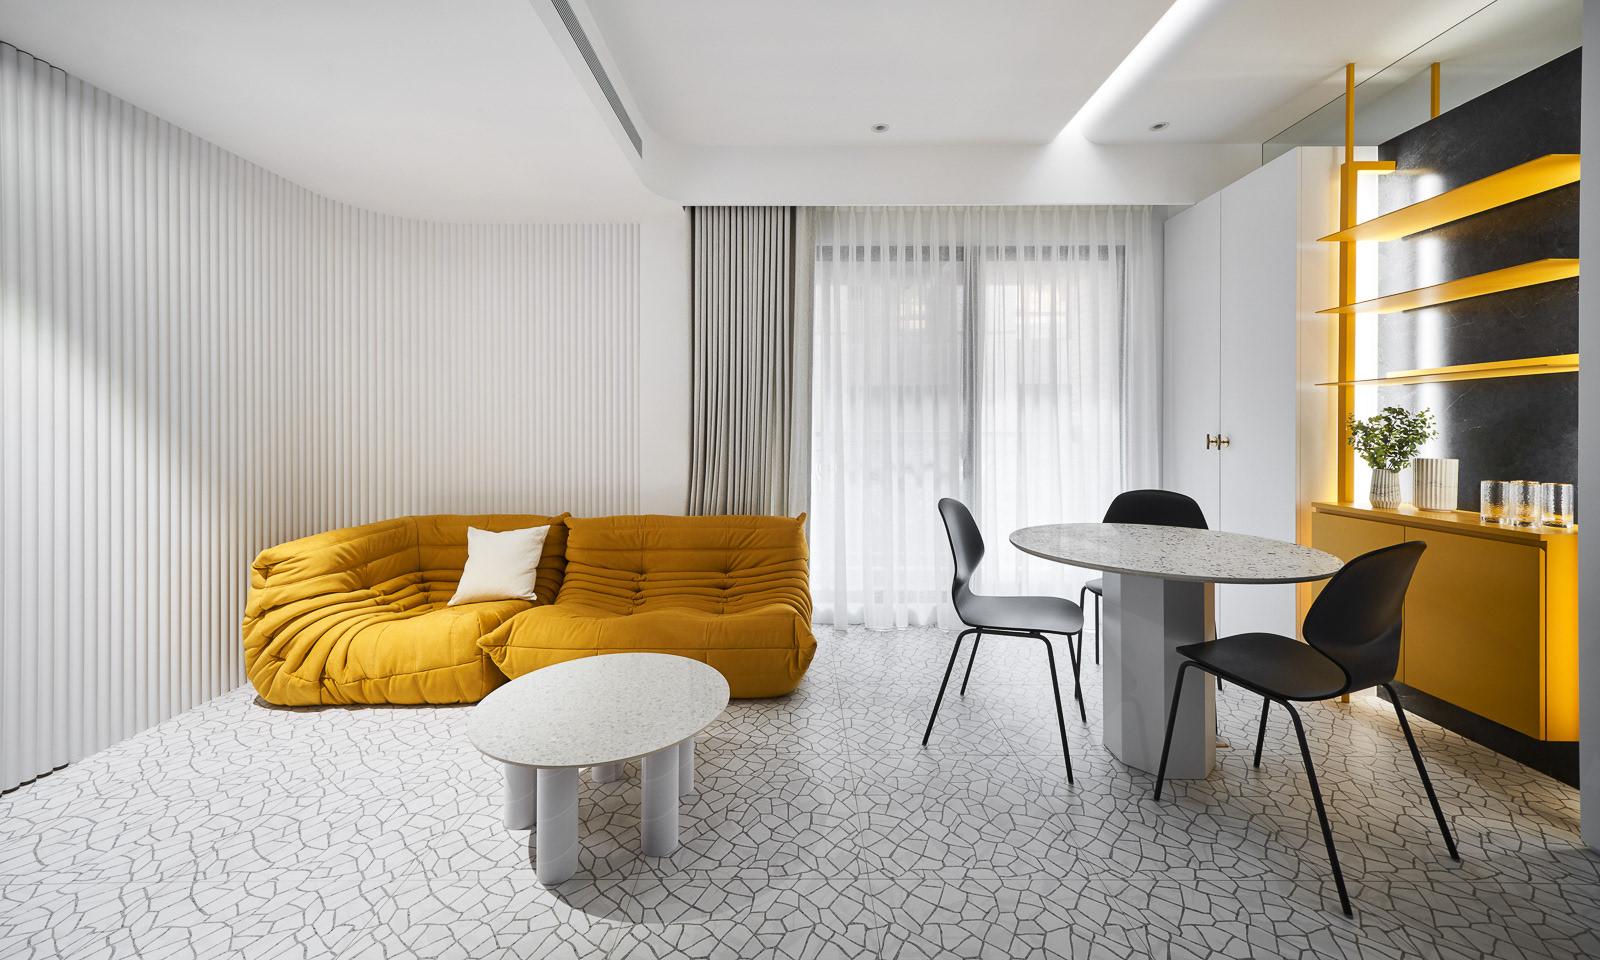 Mustard yellow sofa in a modern grey living room